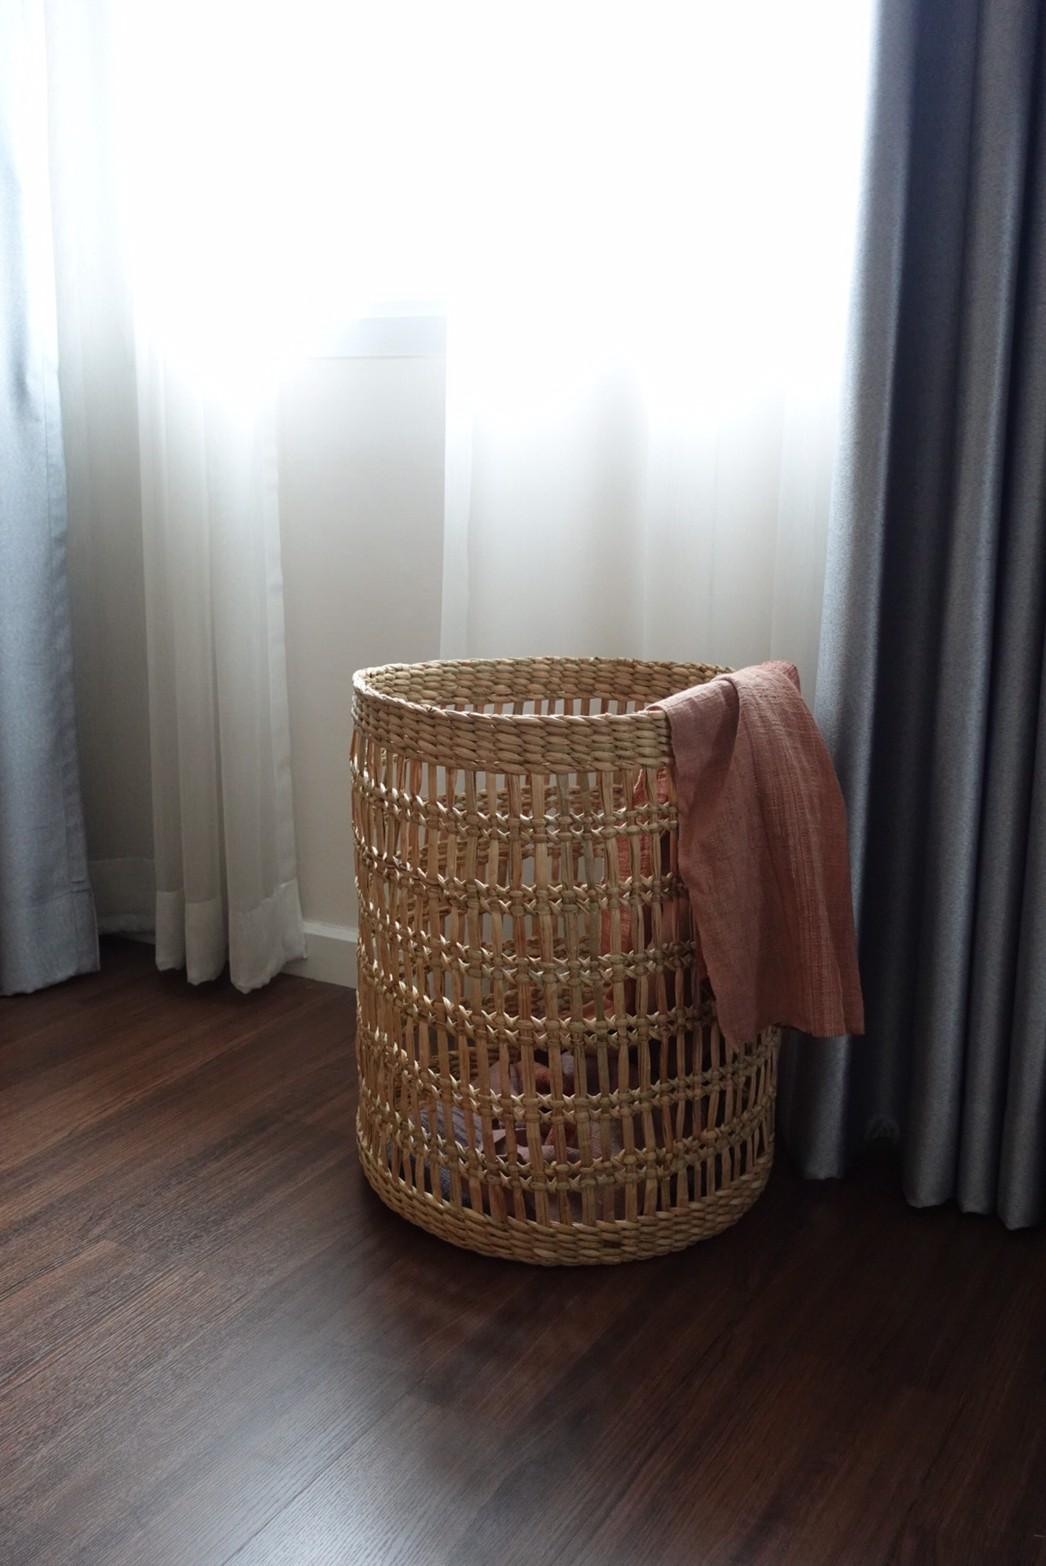 Tied Basket